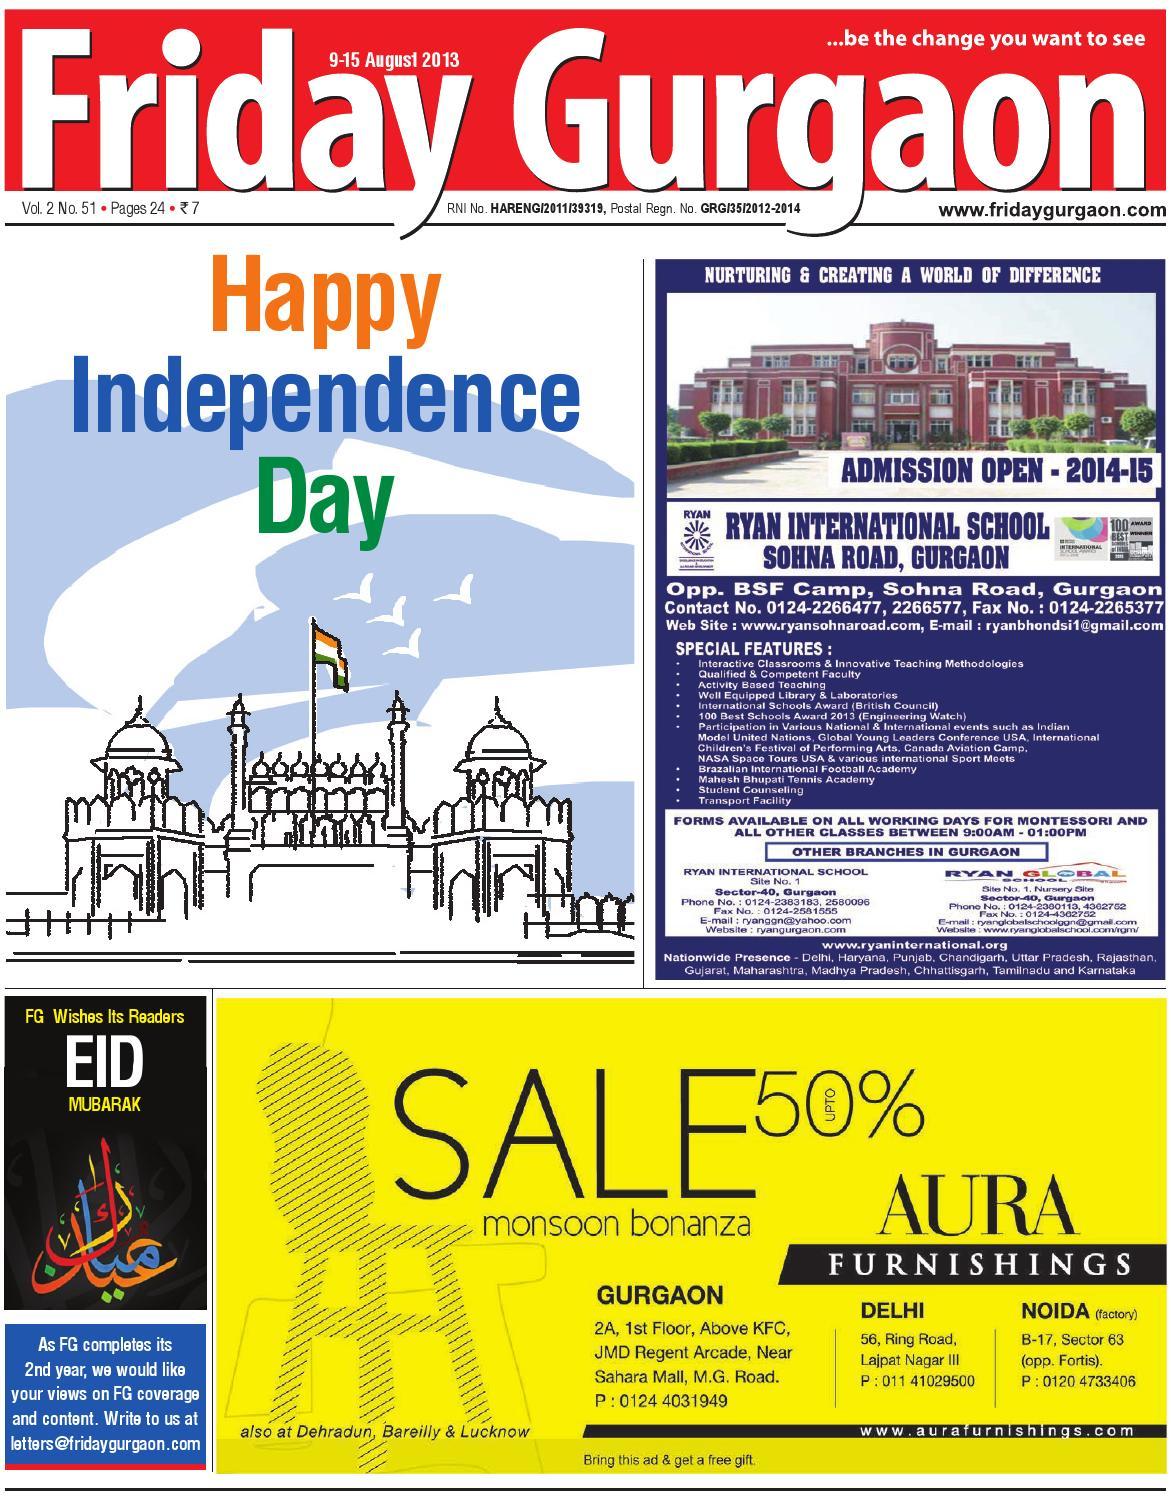 Friday gurgaon august 9 15, 2013 by Friday Gurgaon - issuu